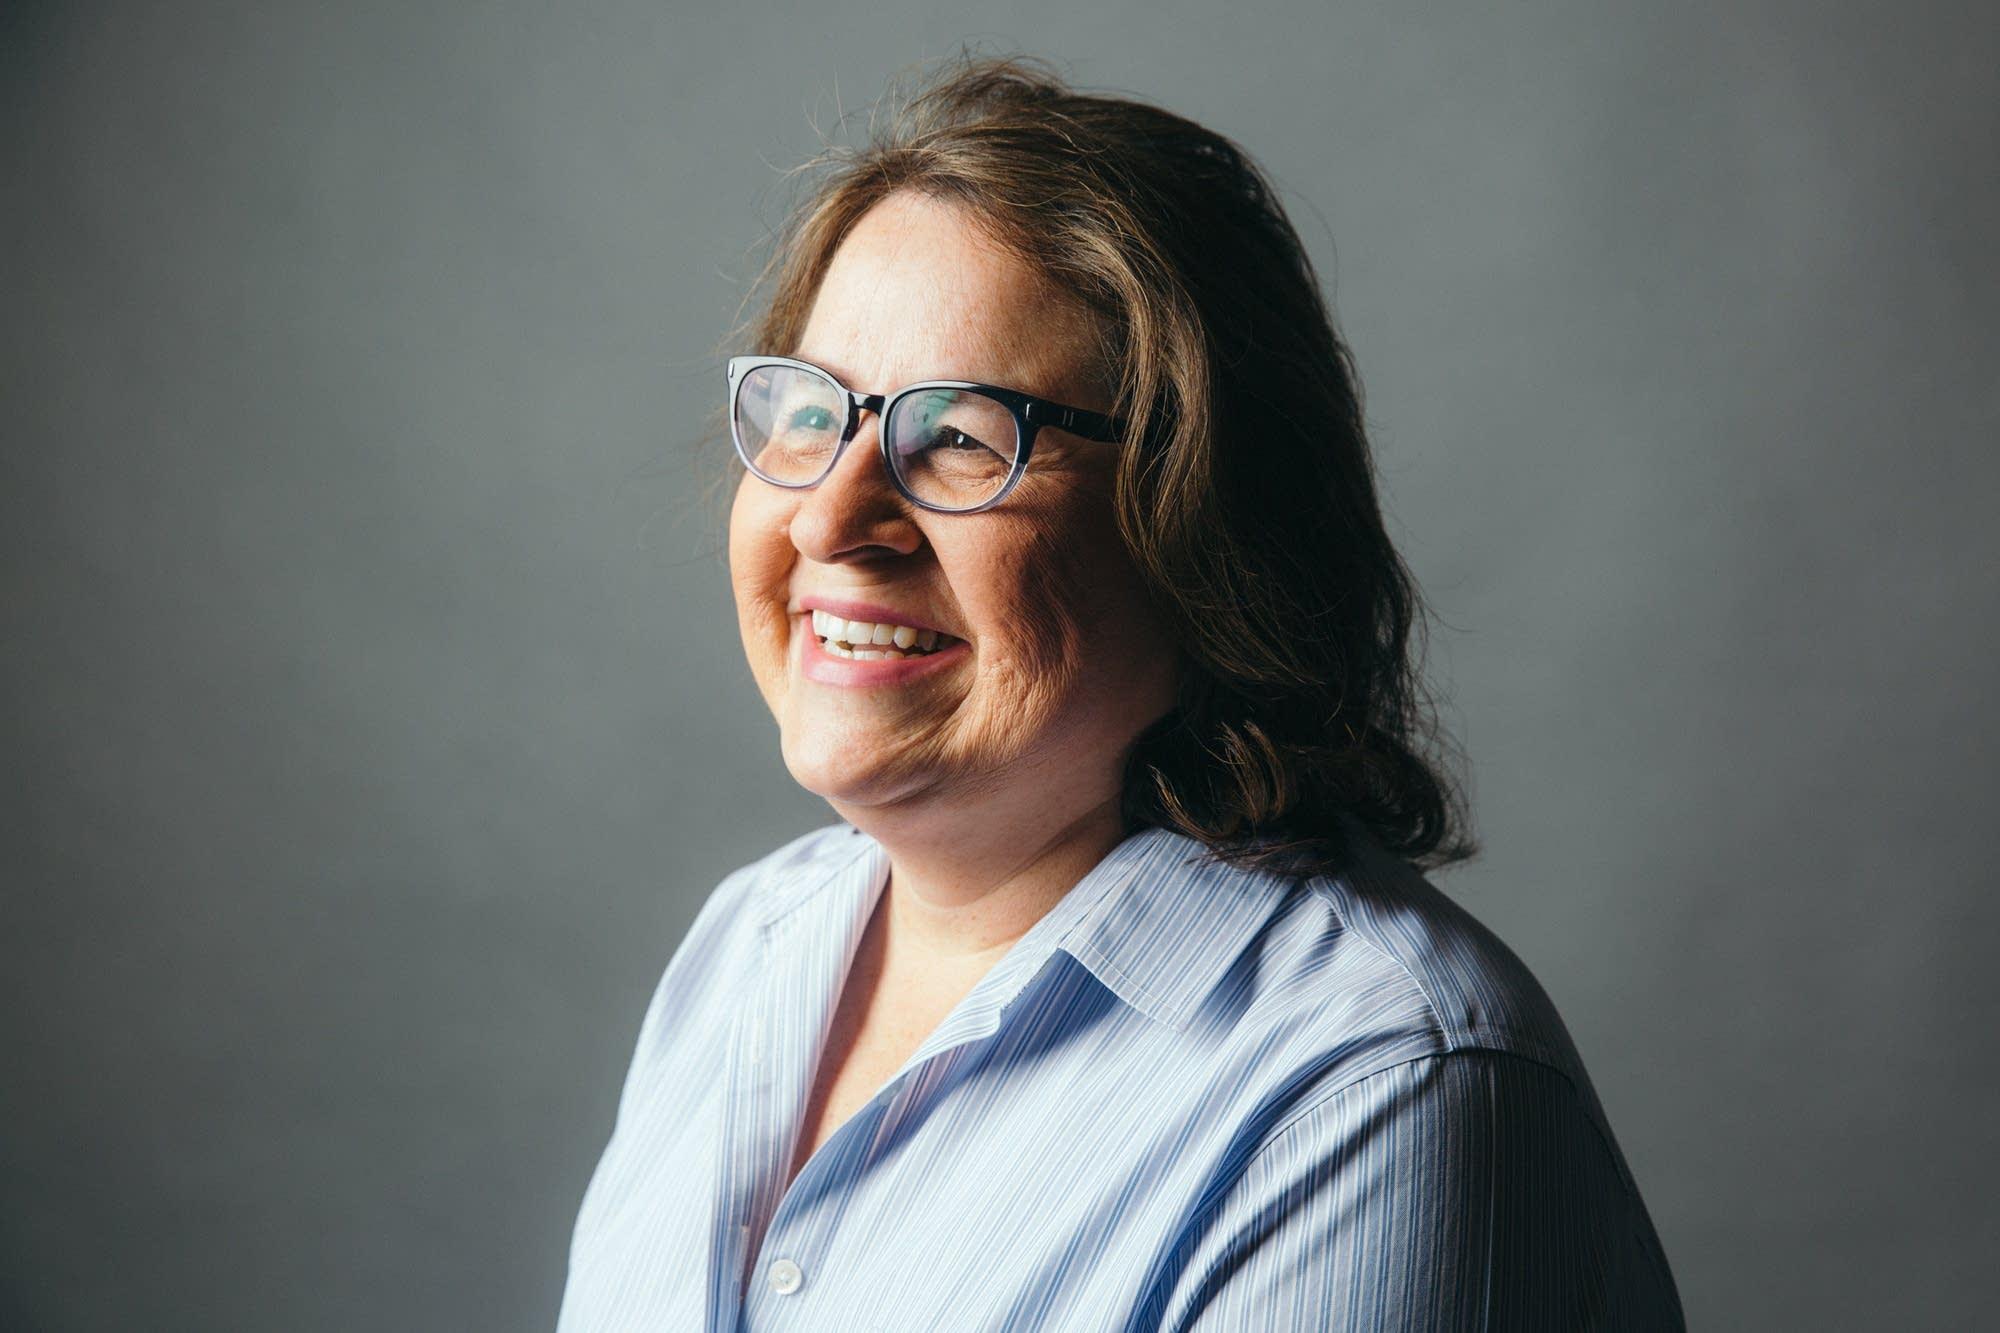 University of Minnesota professor Brenda Child sits for a portrait.